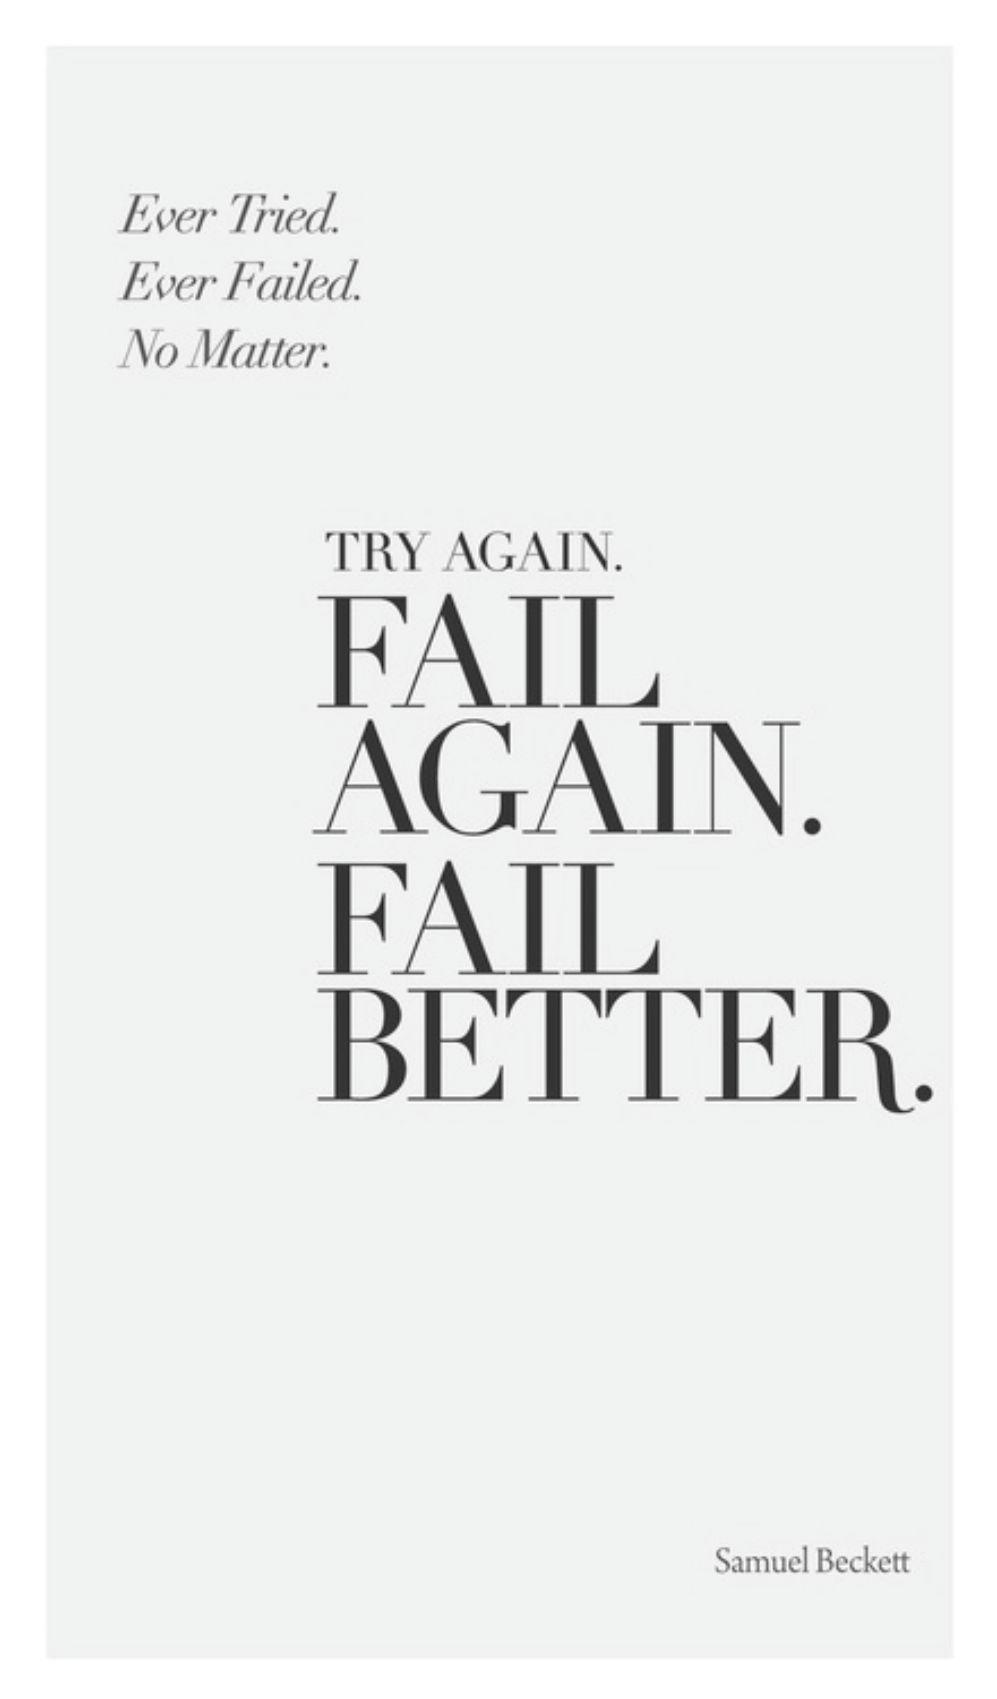 Love Never Fails Quote 40 Pinterestready Inspirational Quotes  Samuel Beckett Wisdom